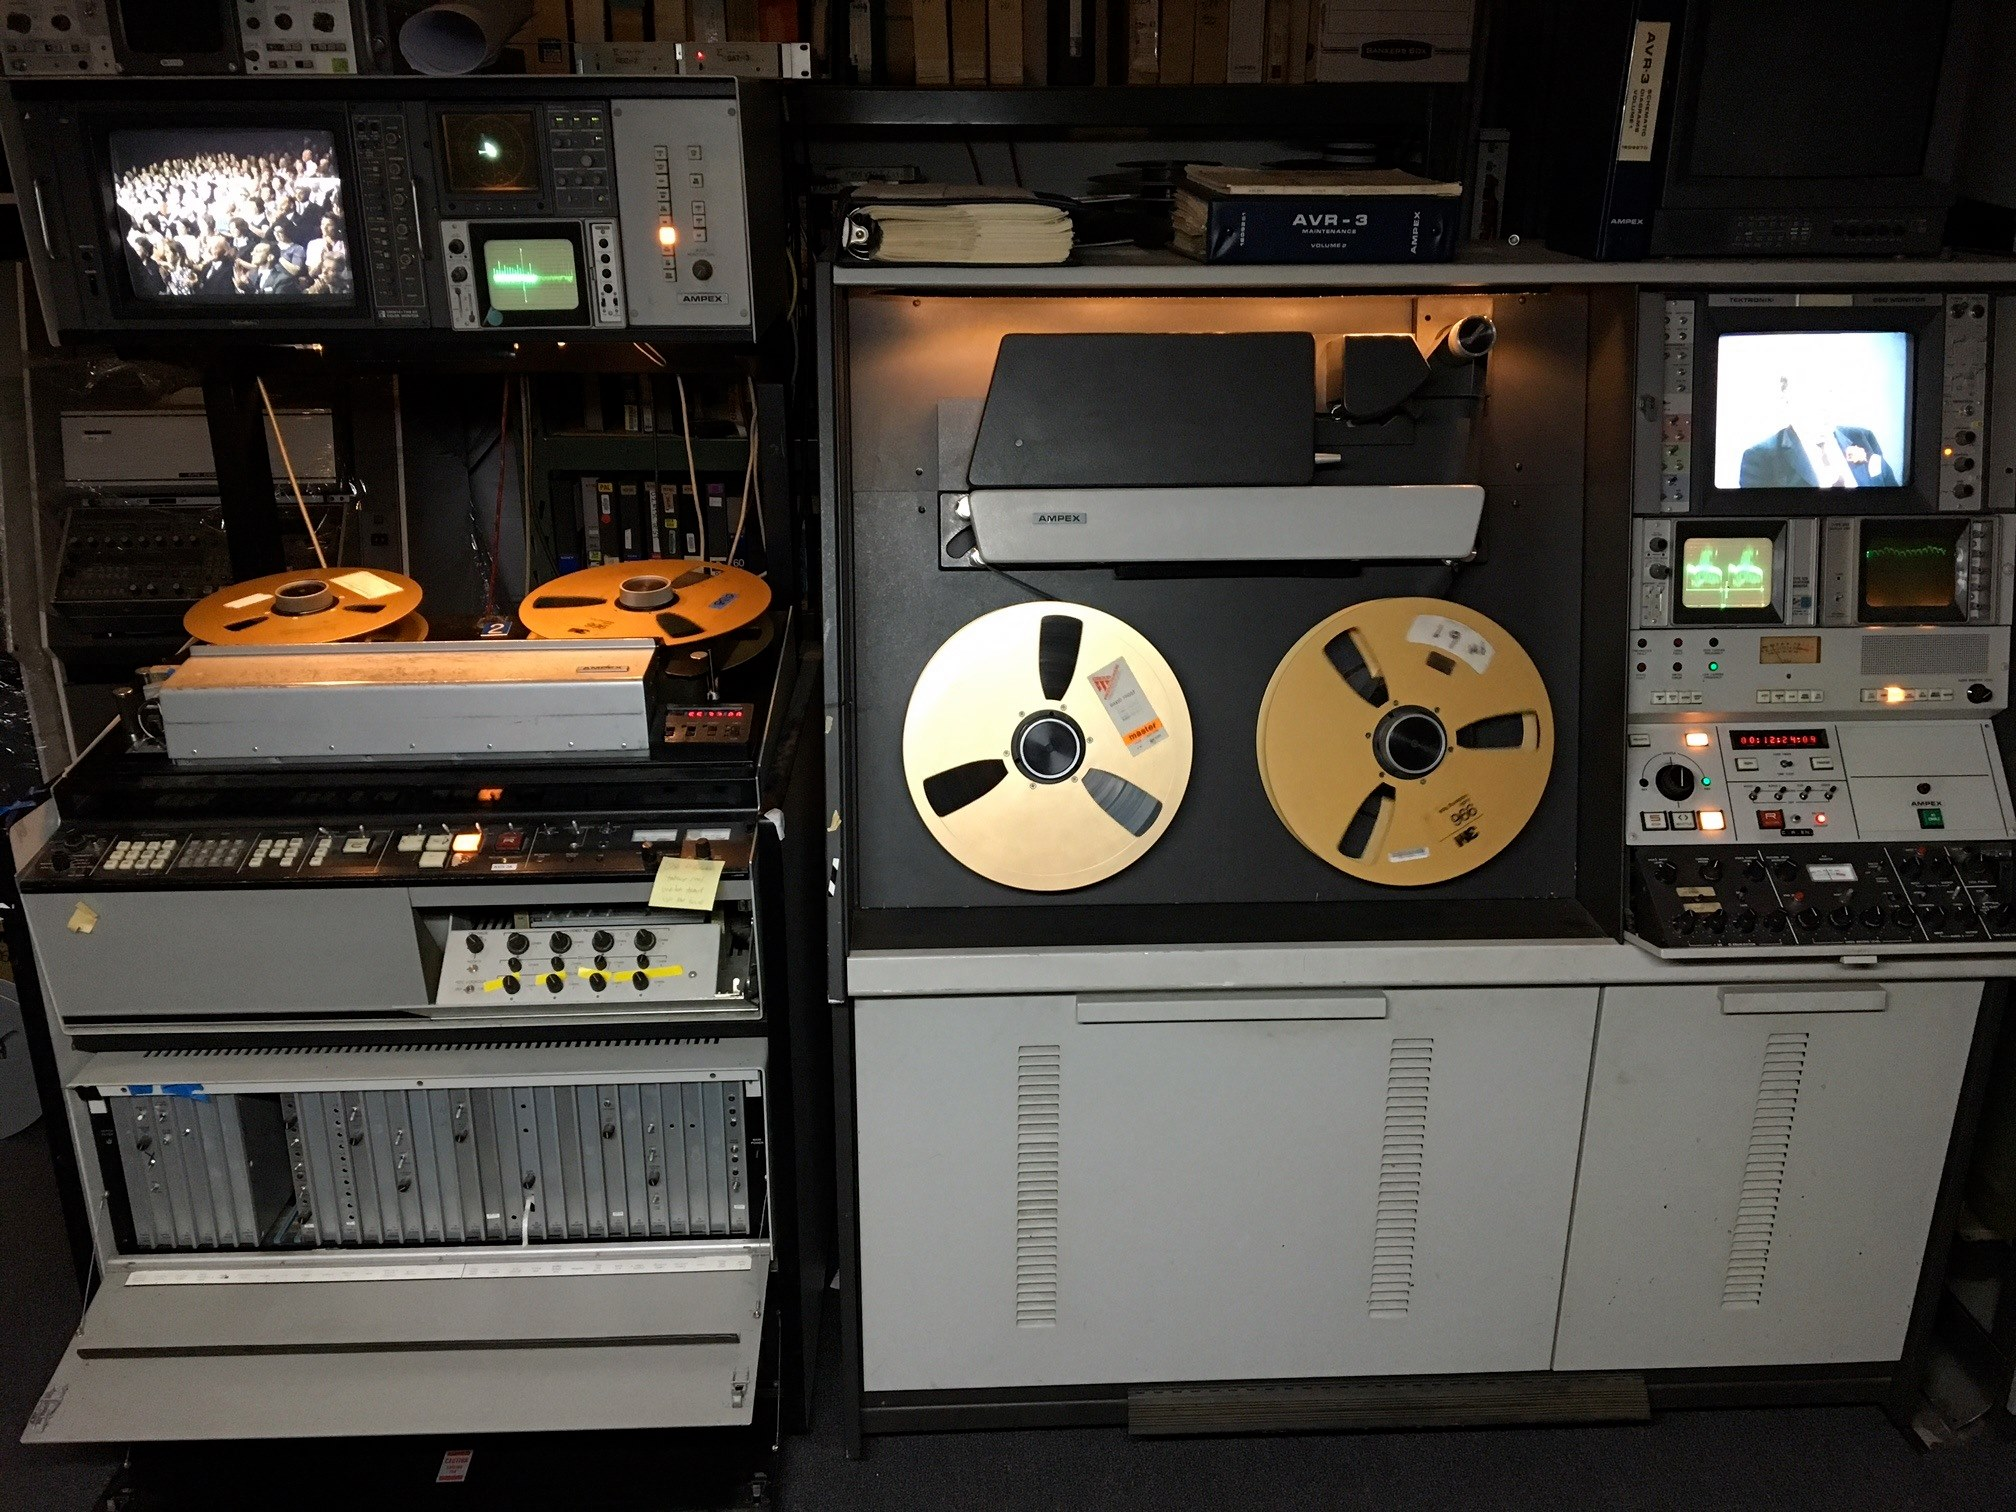 2 inch quad videotape recorders